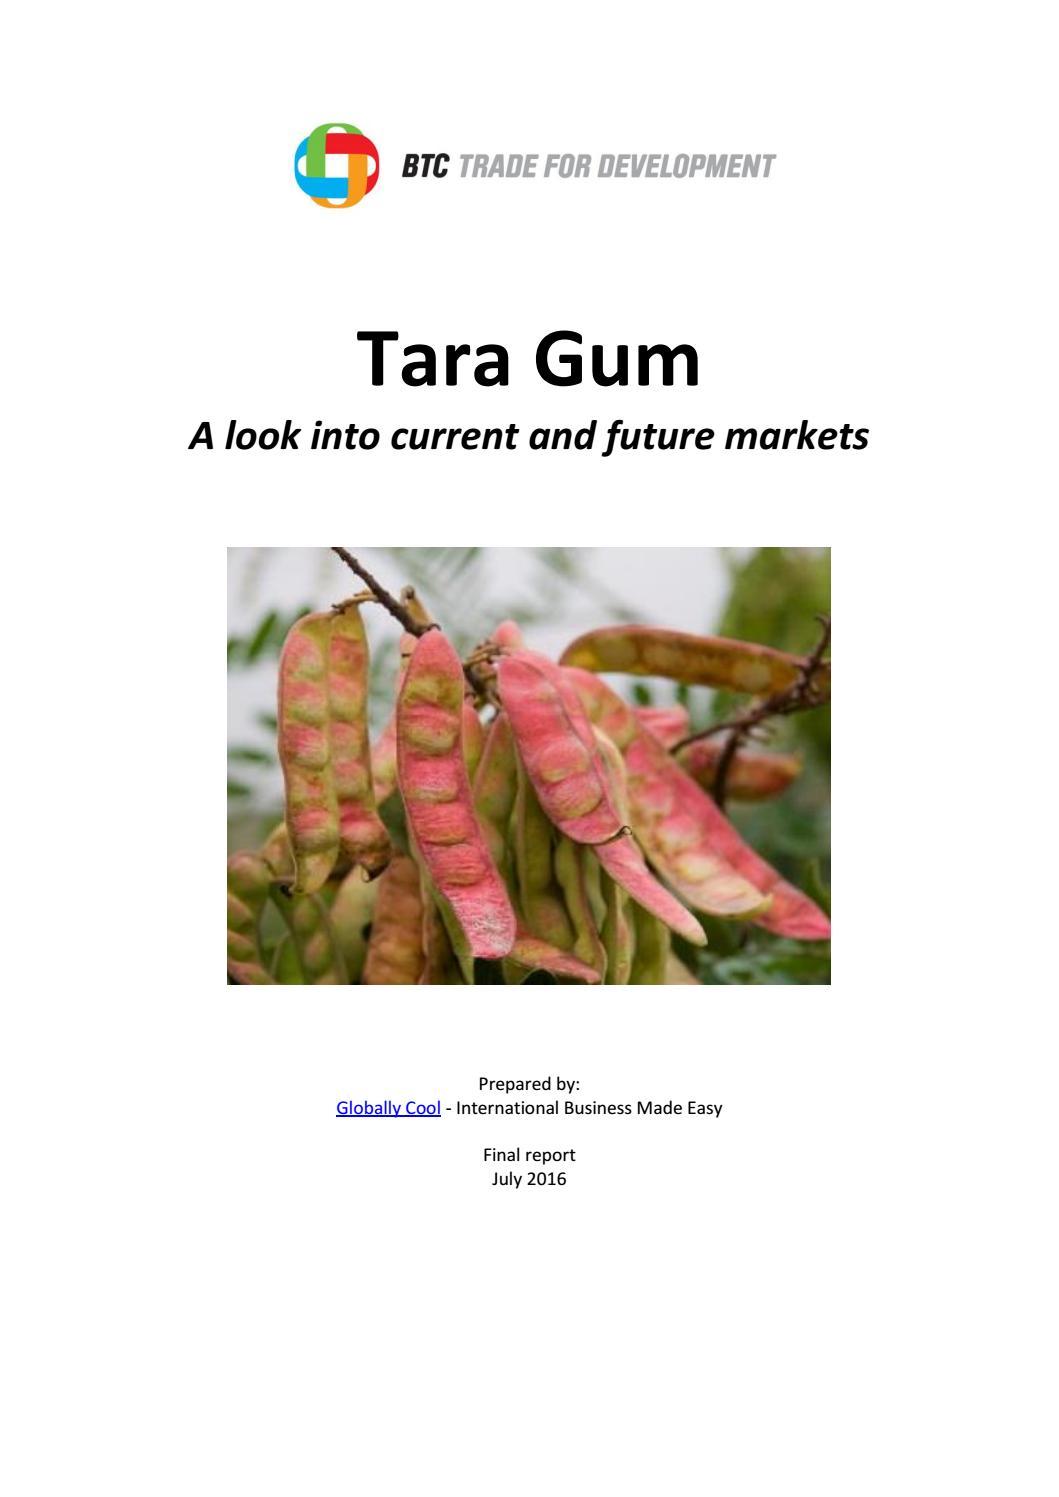 Market study tara gum (english) by Trade for Development